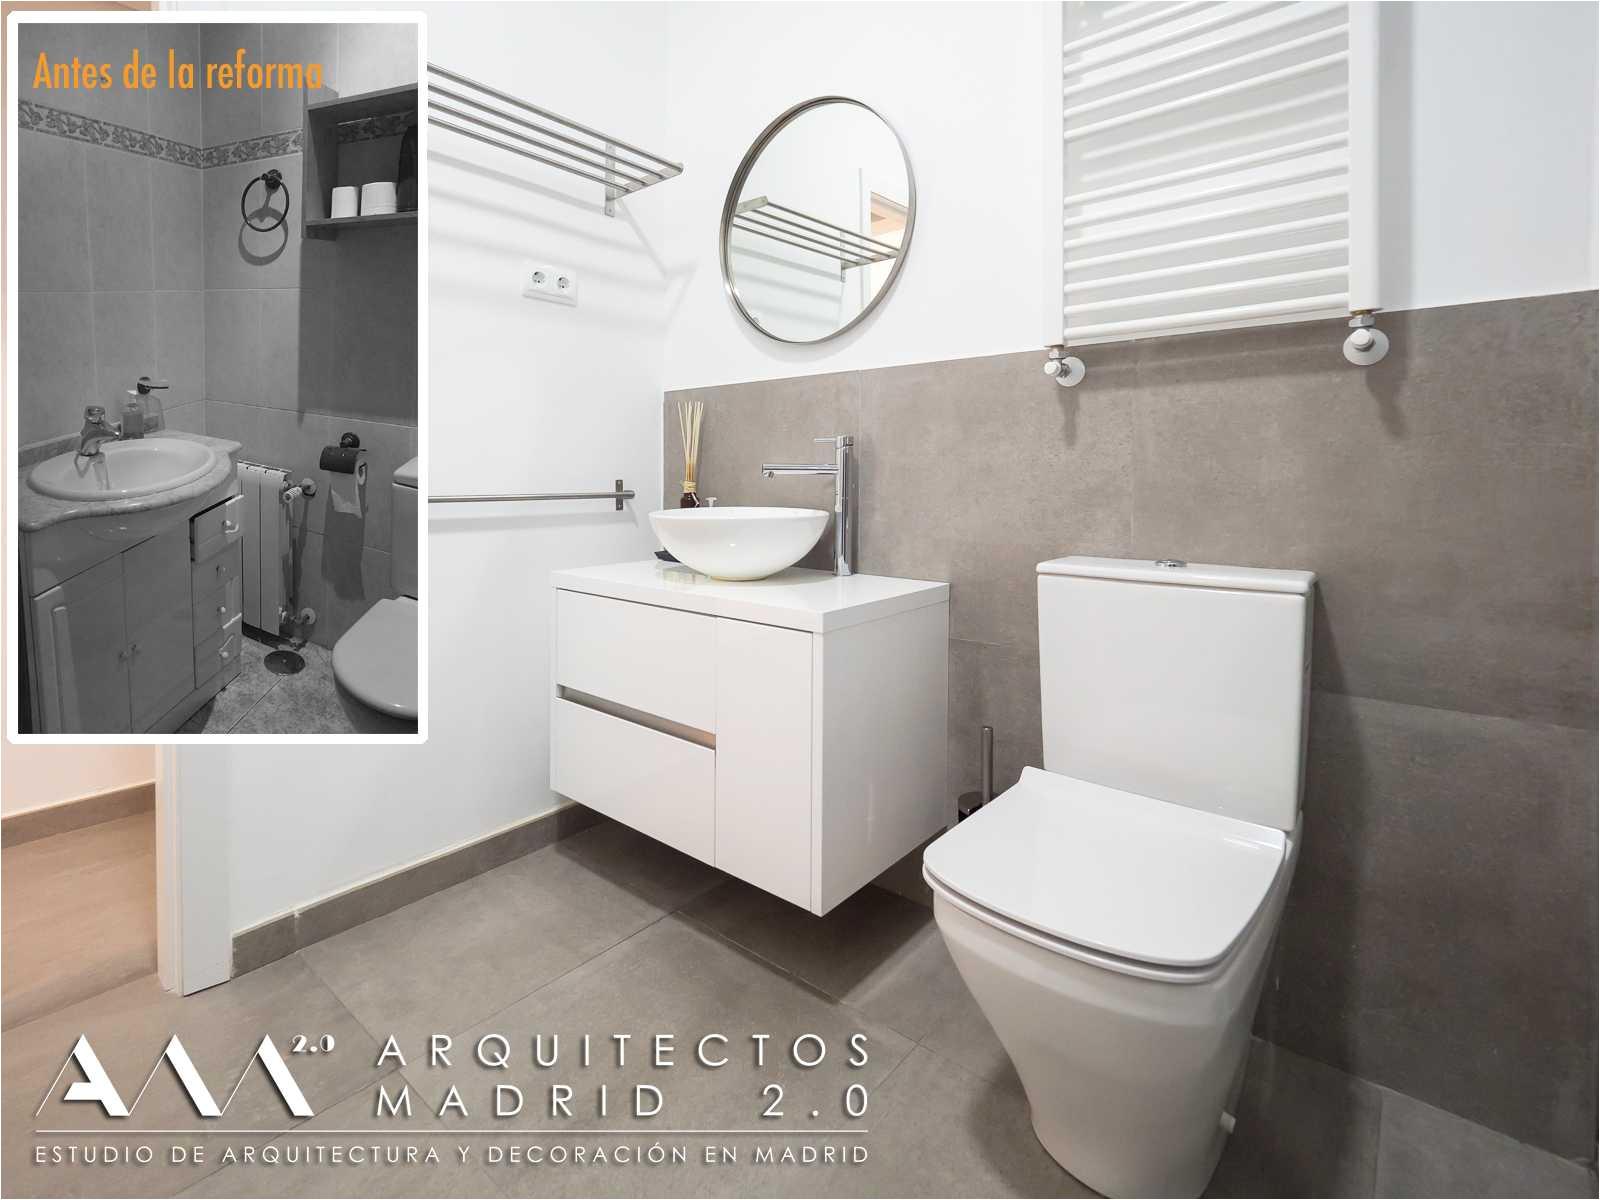 elegant ideas baos pequeos imagenes decoracion de banos pequenos modernos diseno with decoracion baos pequeos modernos